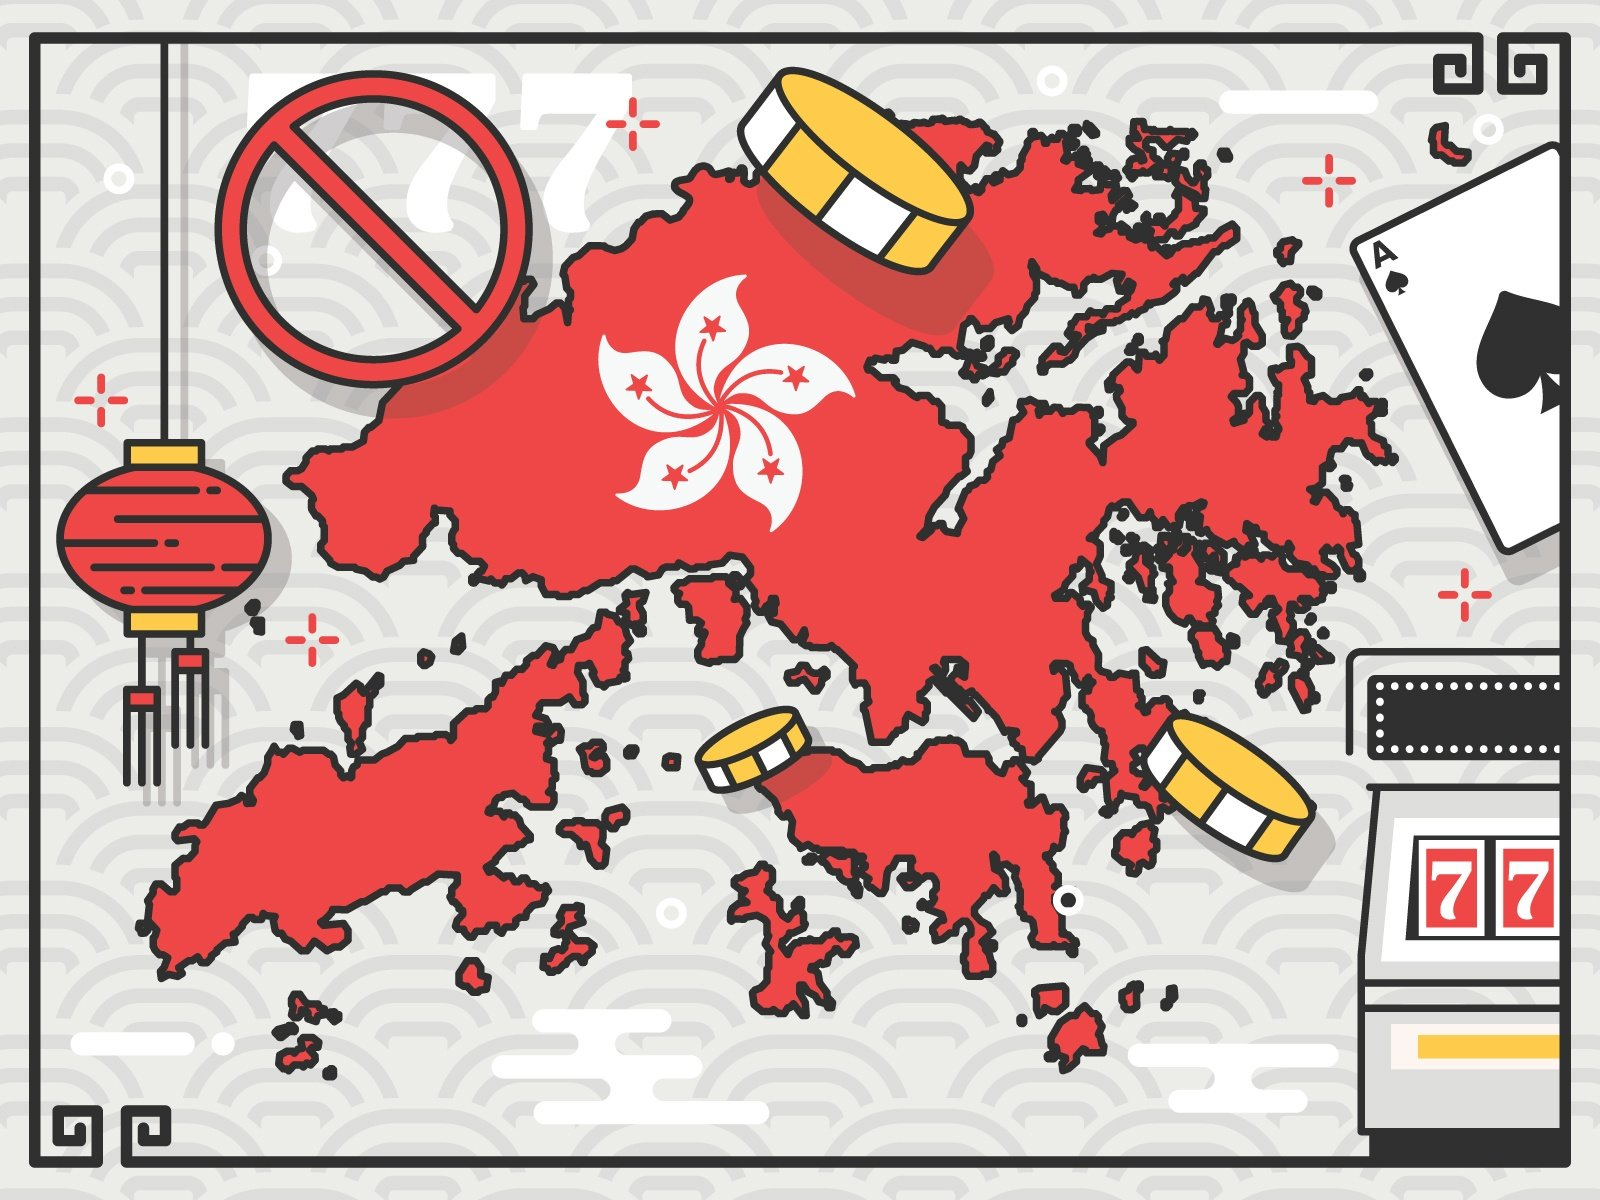 Image showing map of Hong Kong with gambling illustrations surrounding it